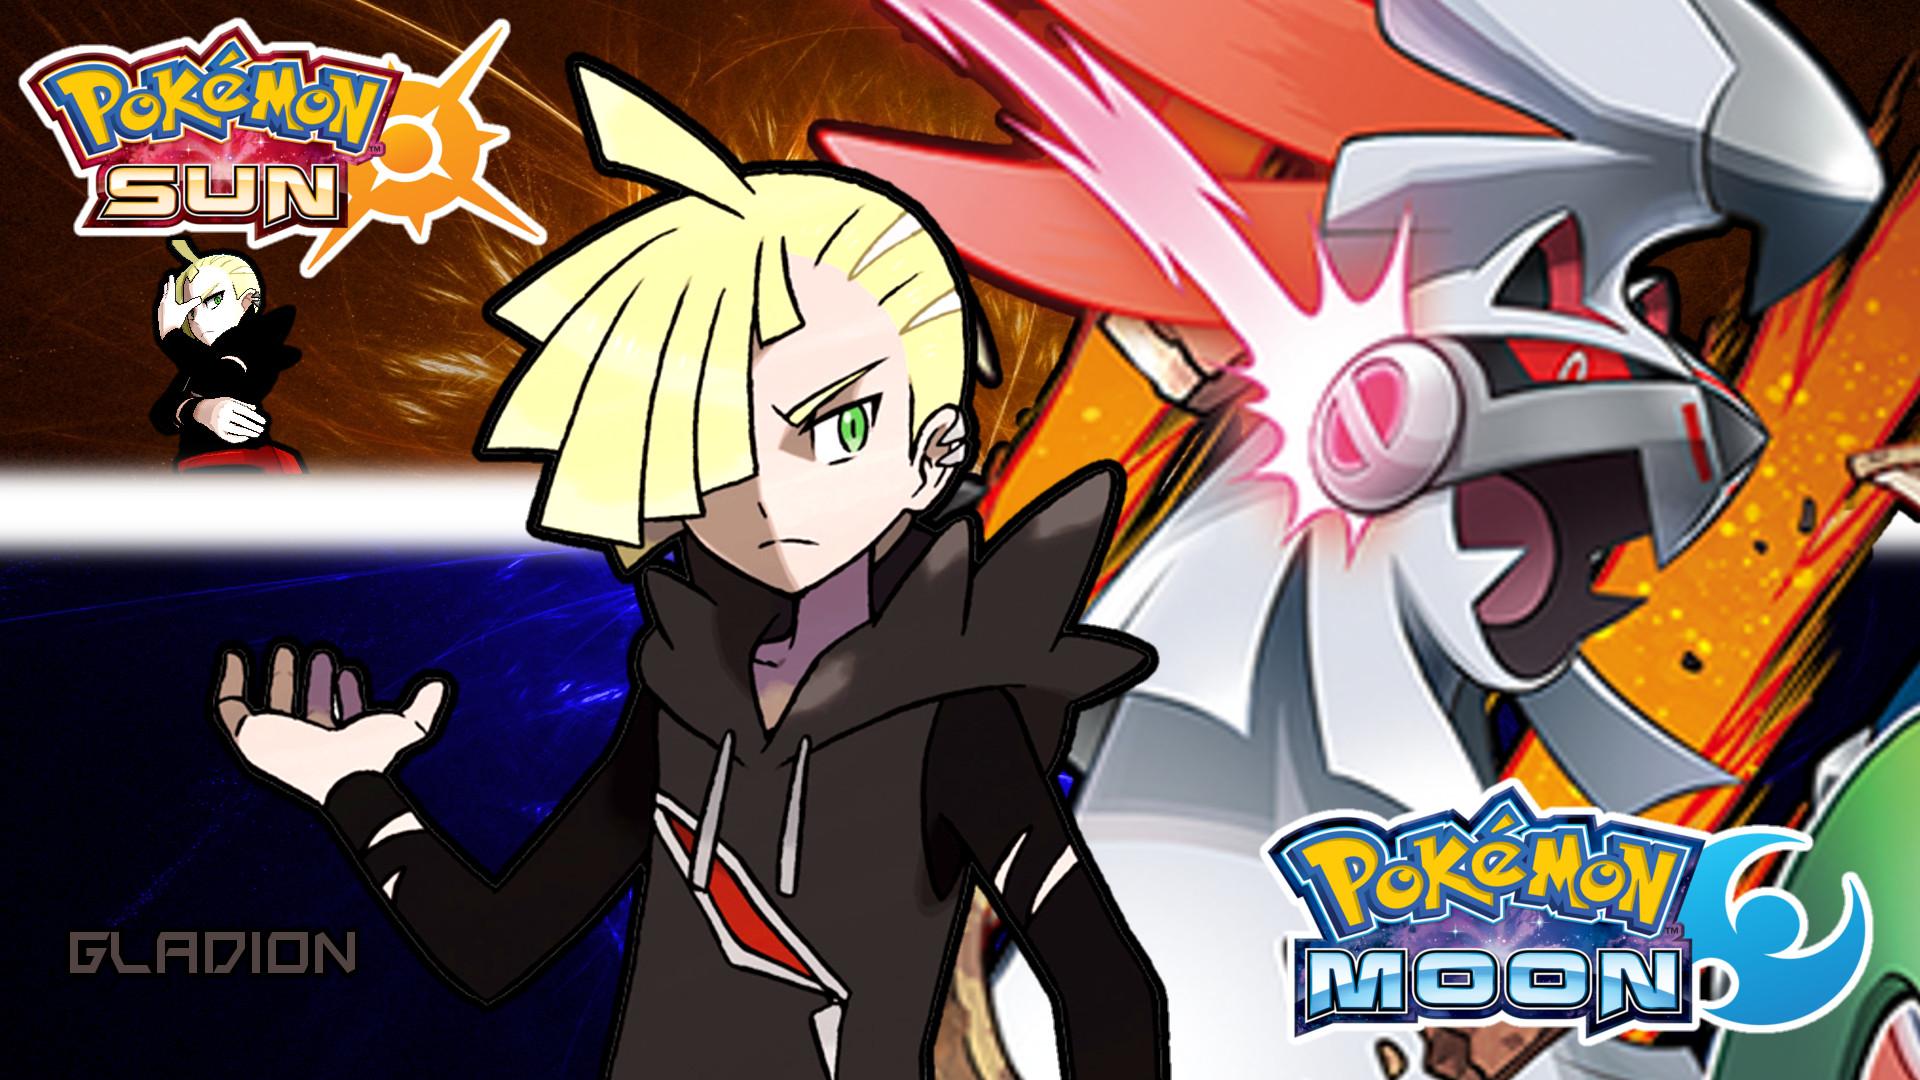 Gladion Wallpaper by MattPlaysVG Pokemon Sun AND Moon! Gladion Wallpaper by  MattPlaysVG